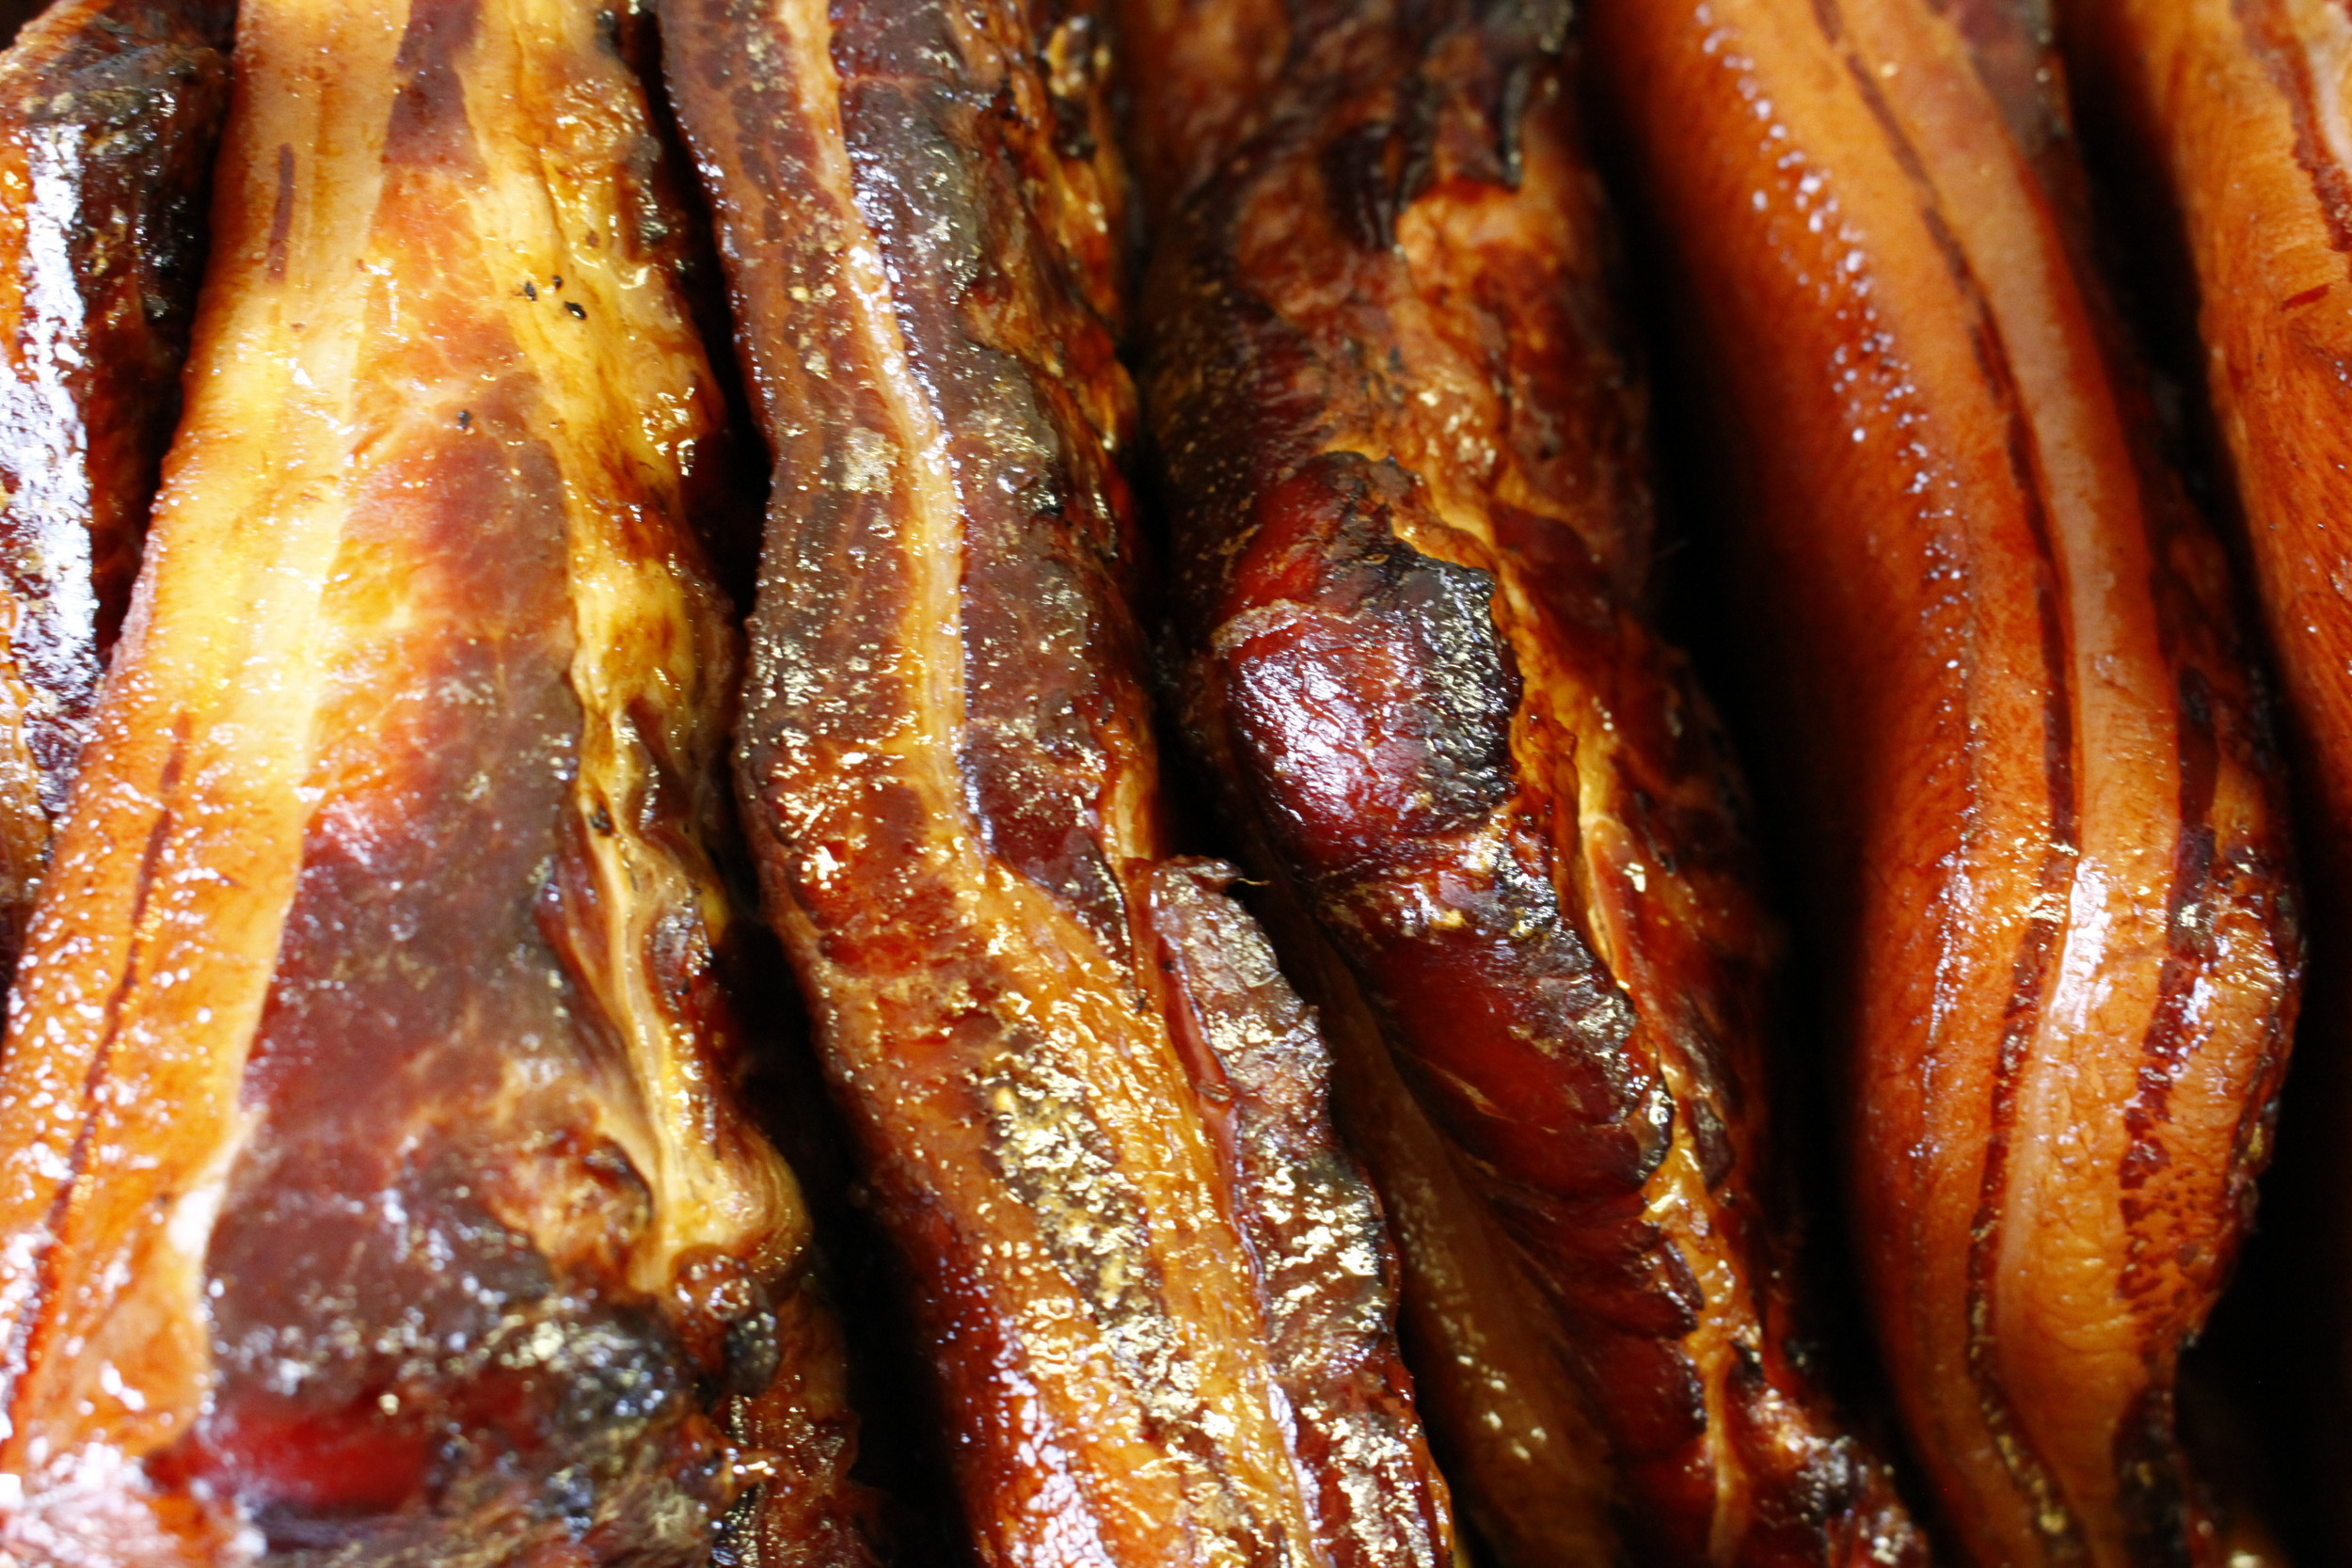 Double smoked bacon